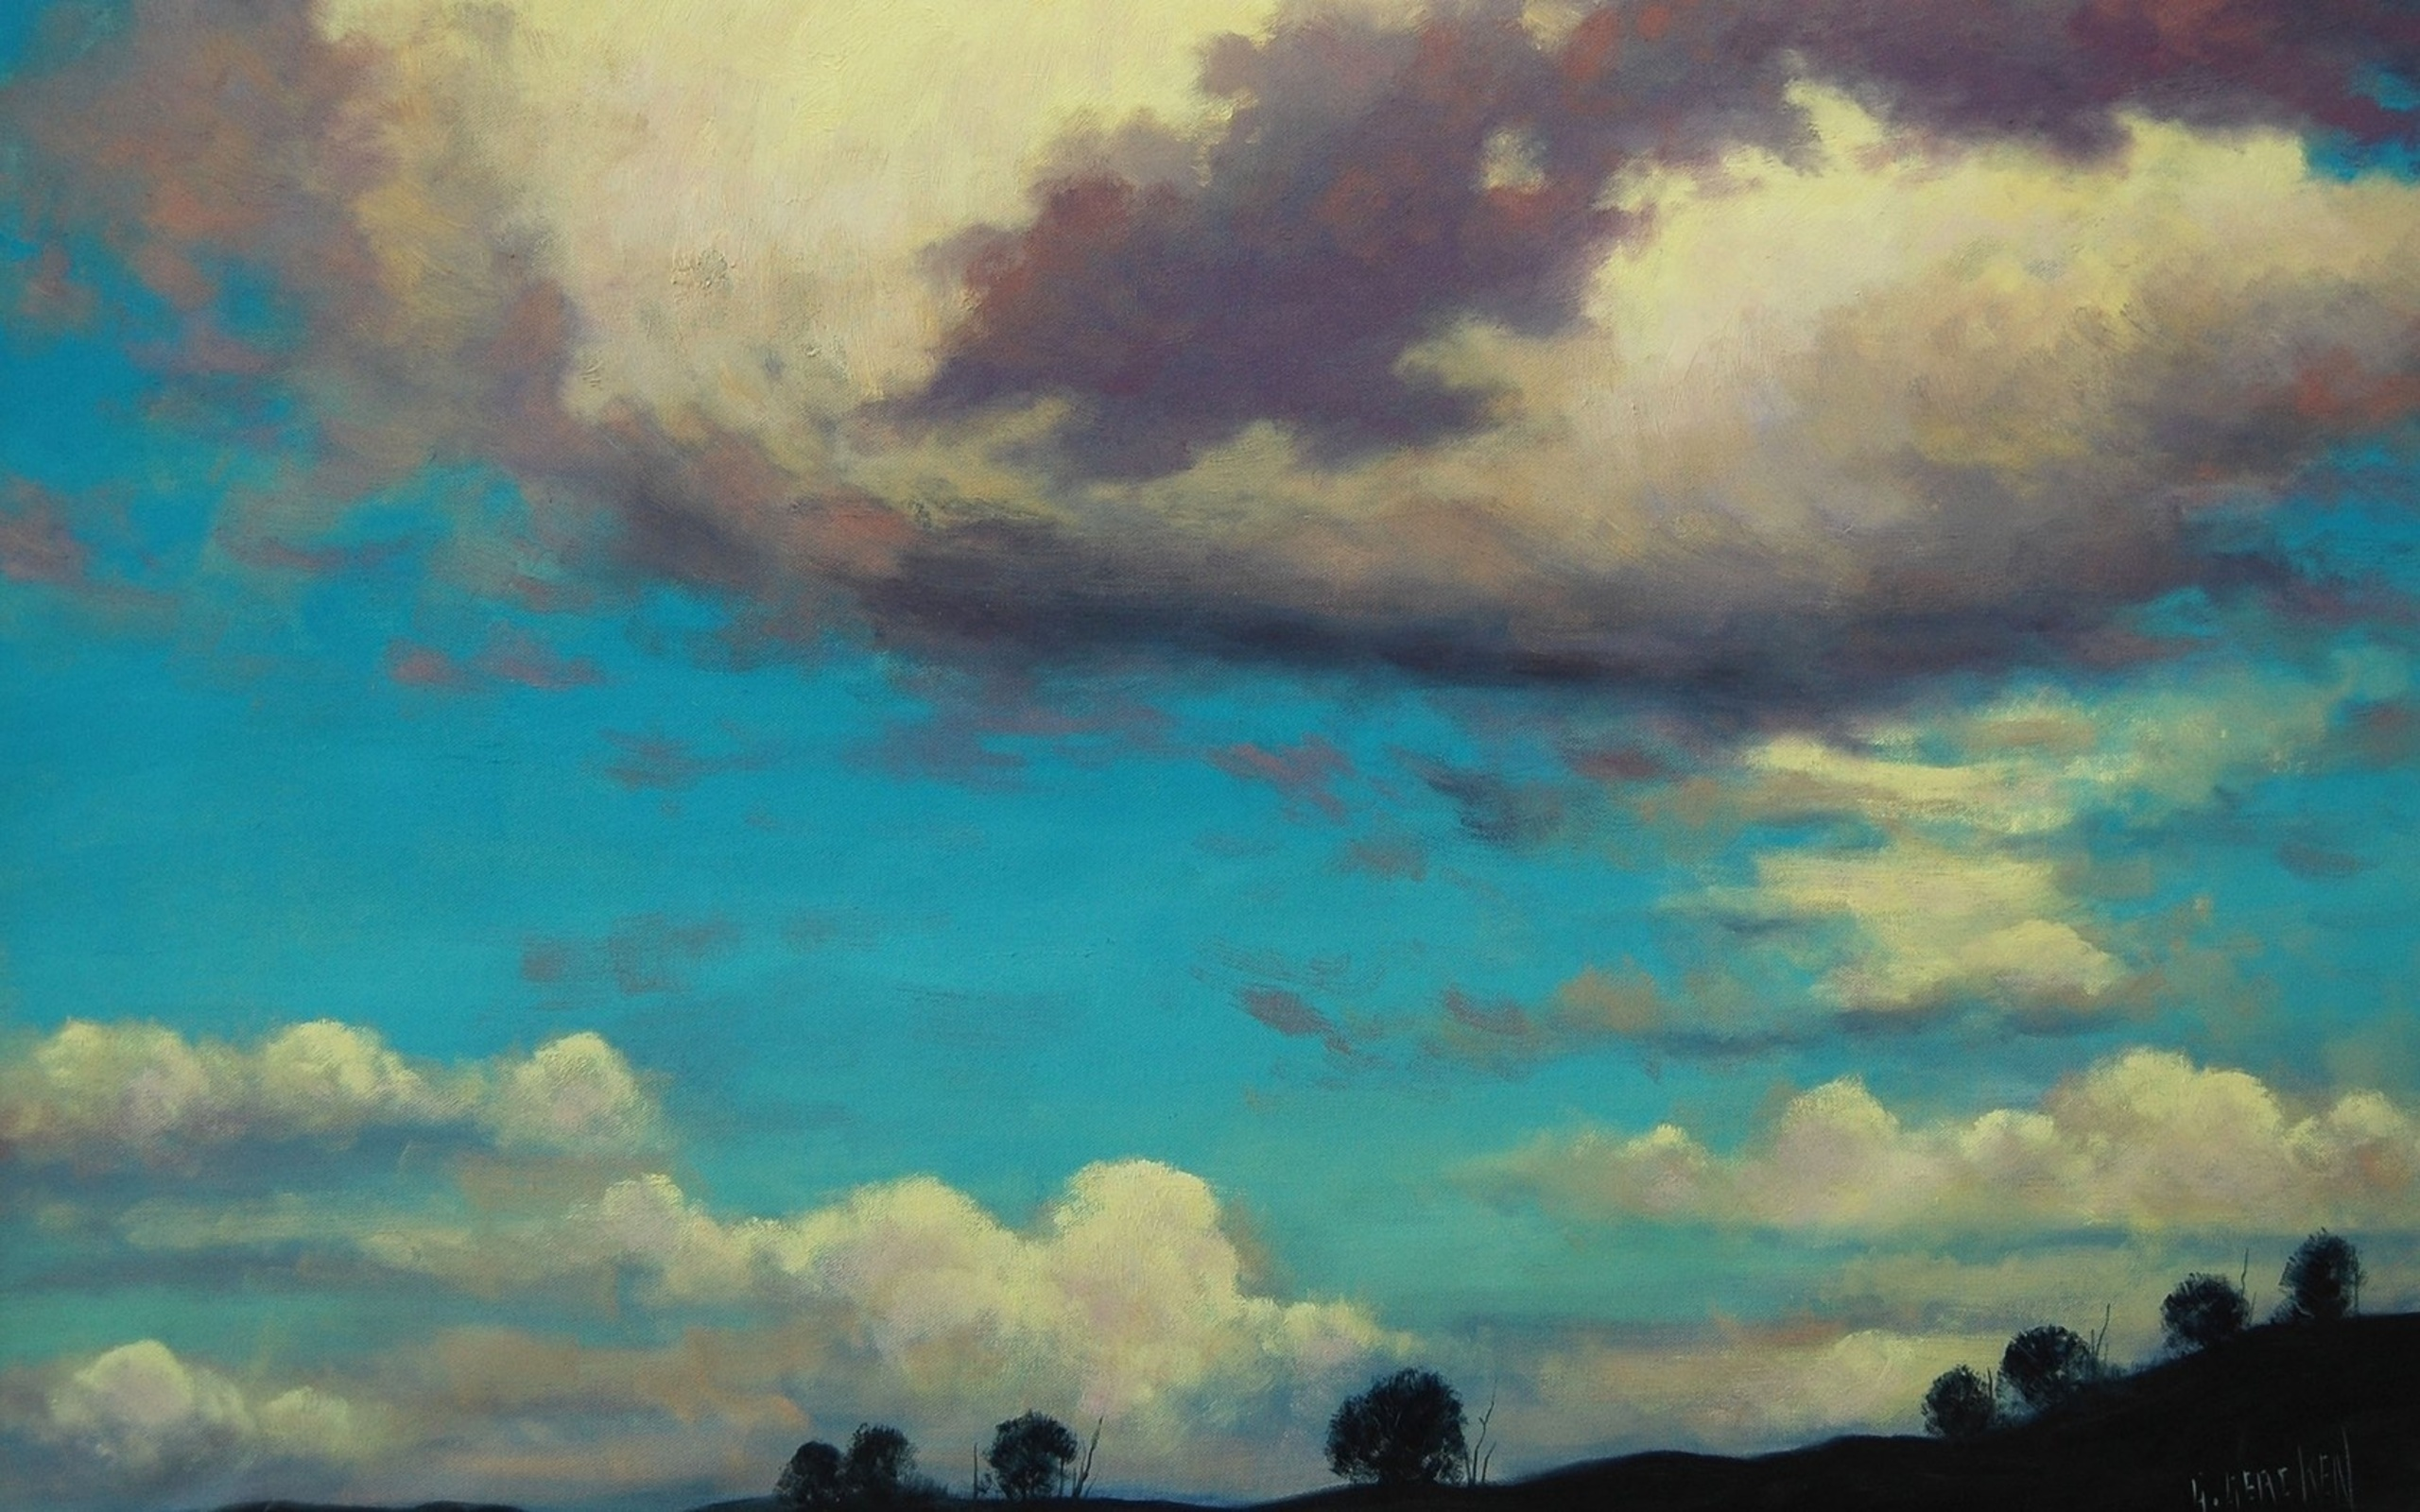 Sky Art Wallpaper